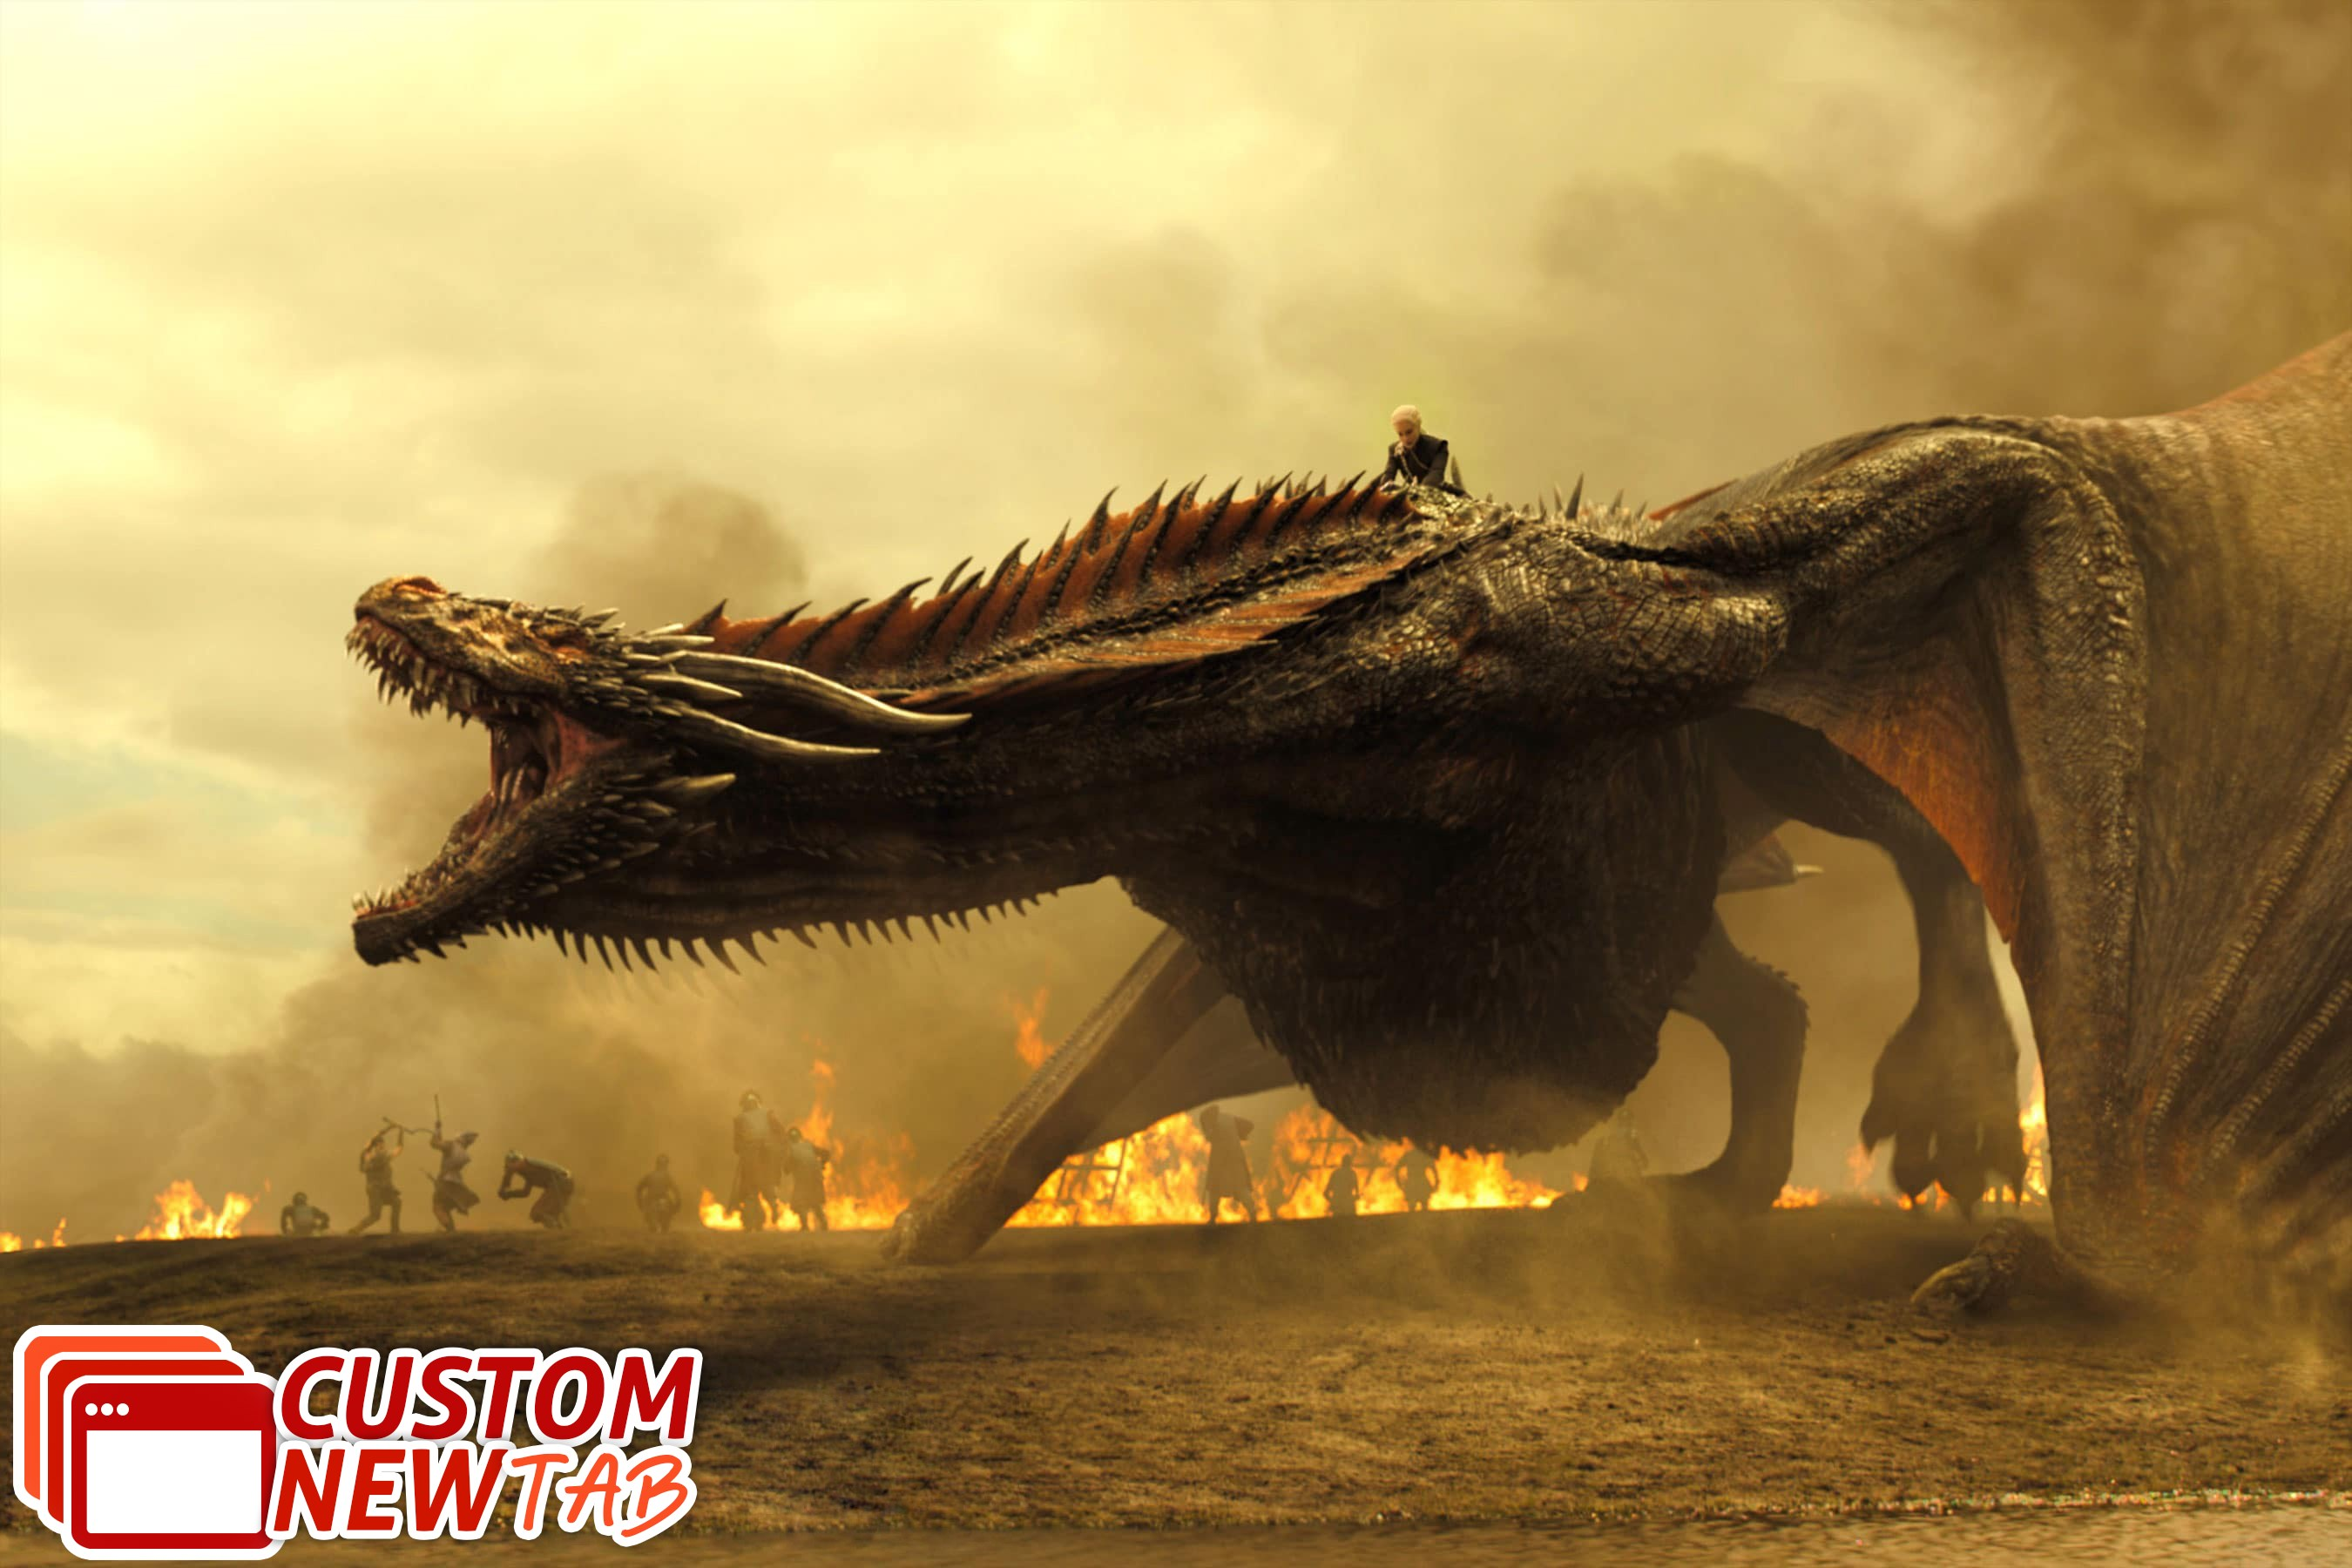 Game Of Thrones Dragon Hd - HD Wallpaper